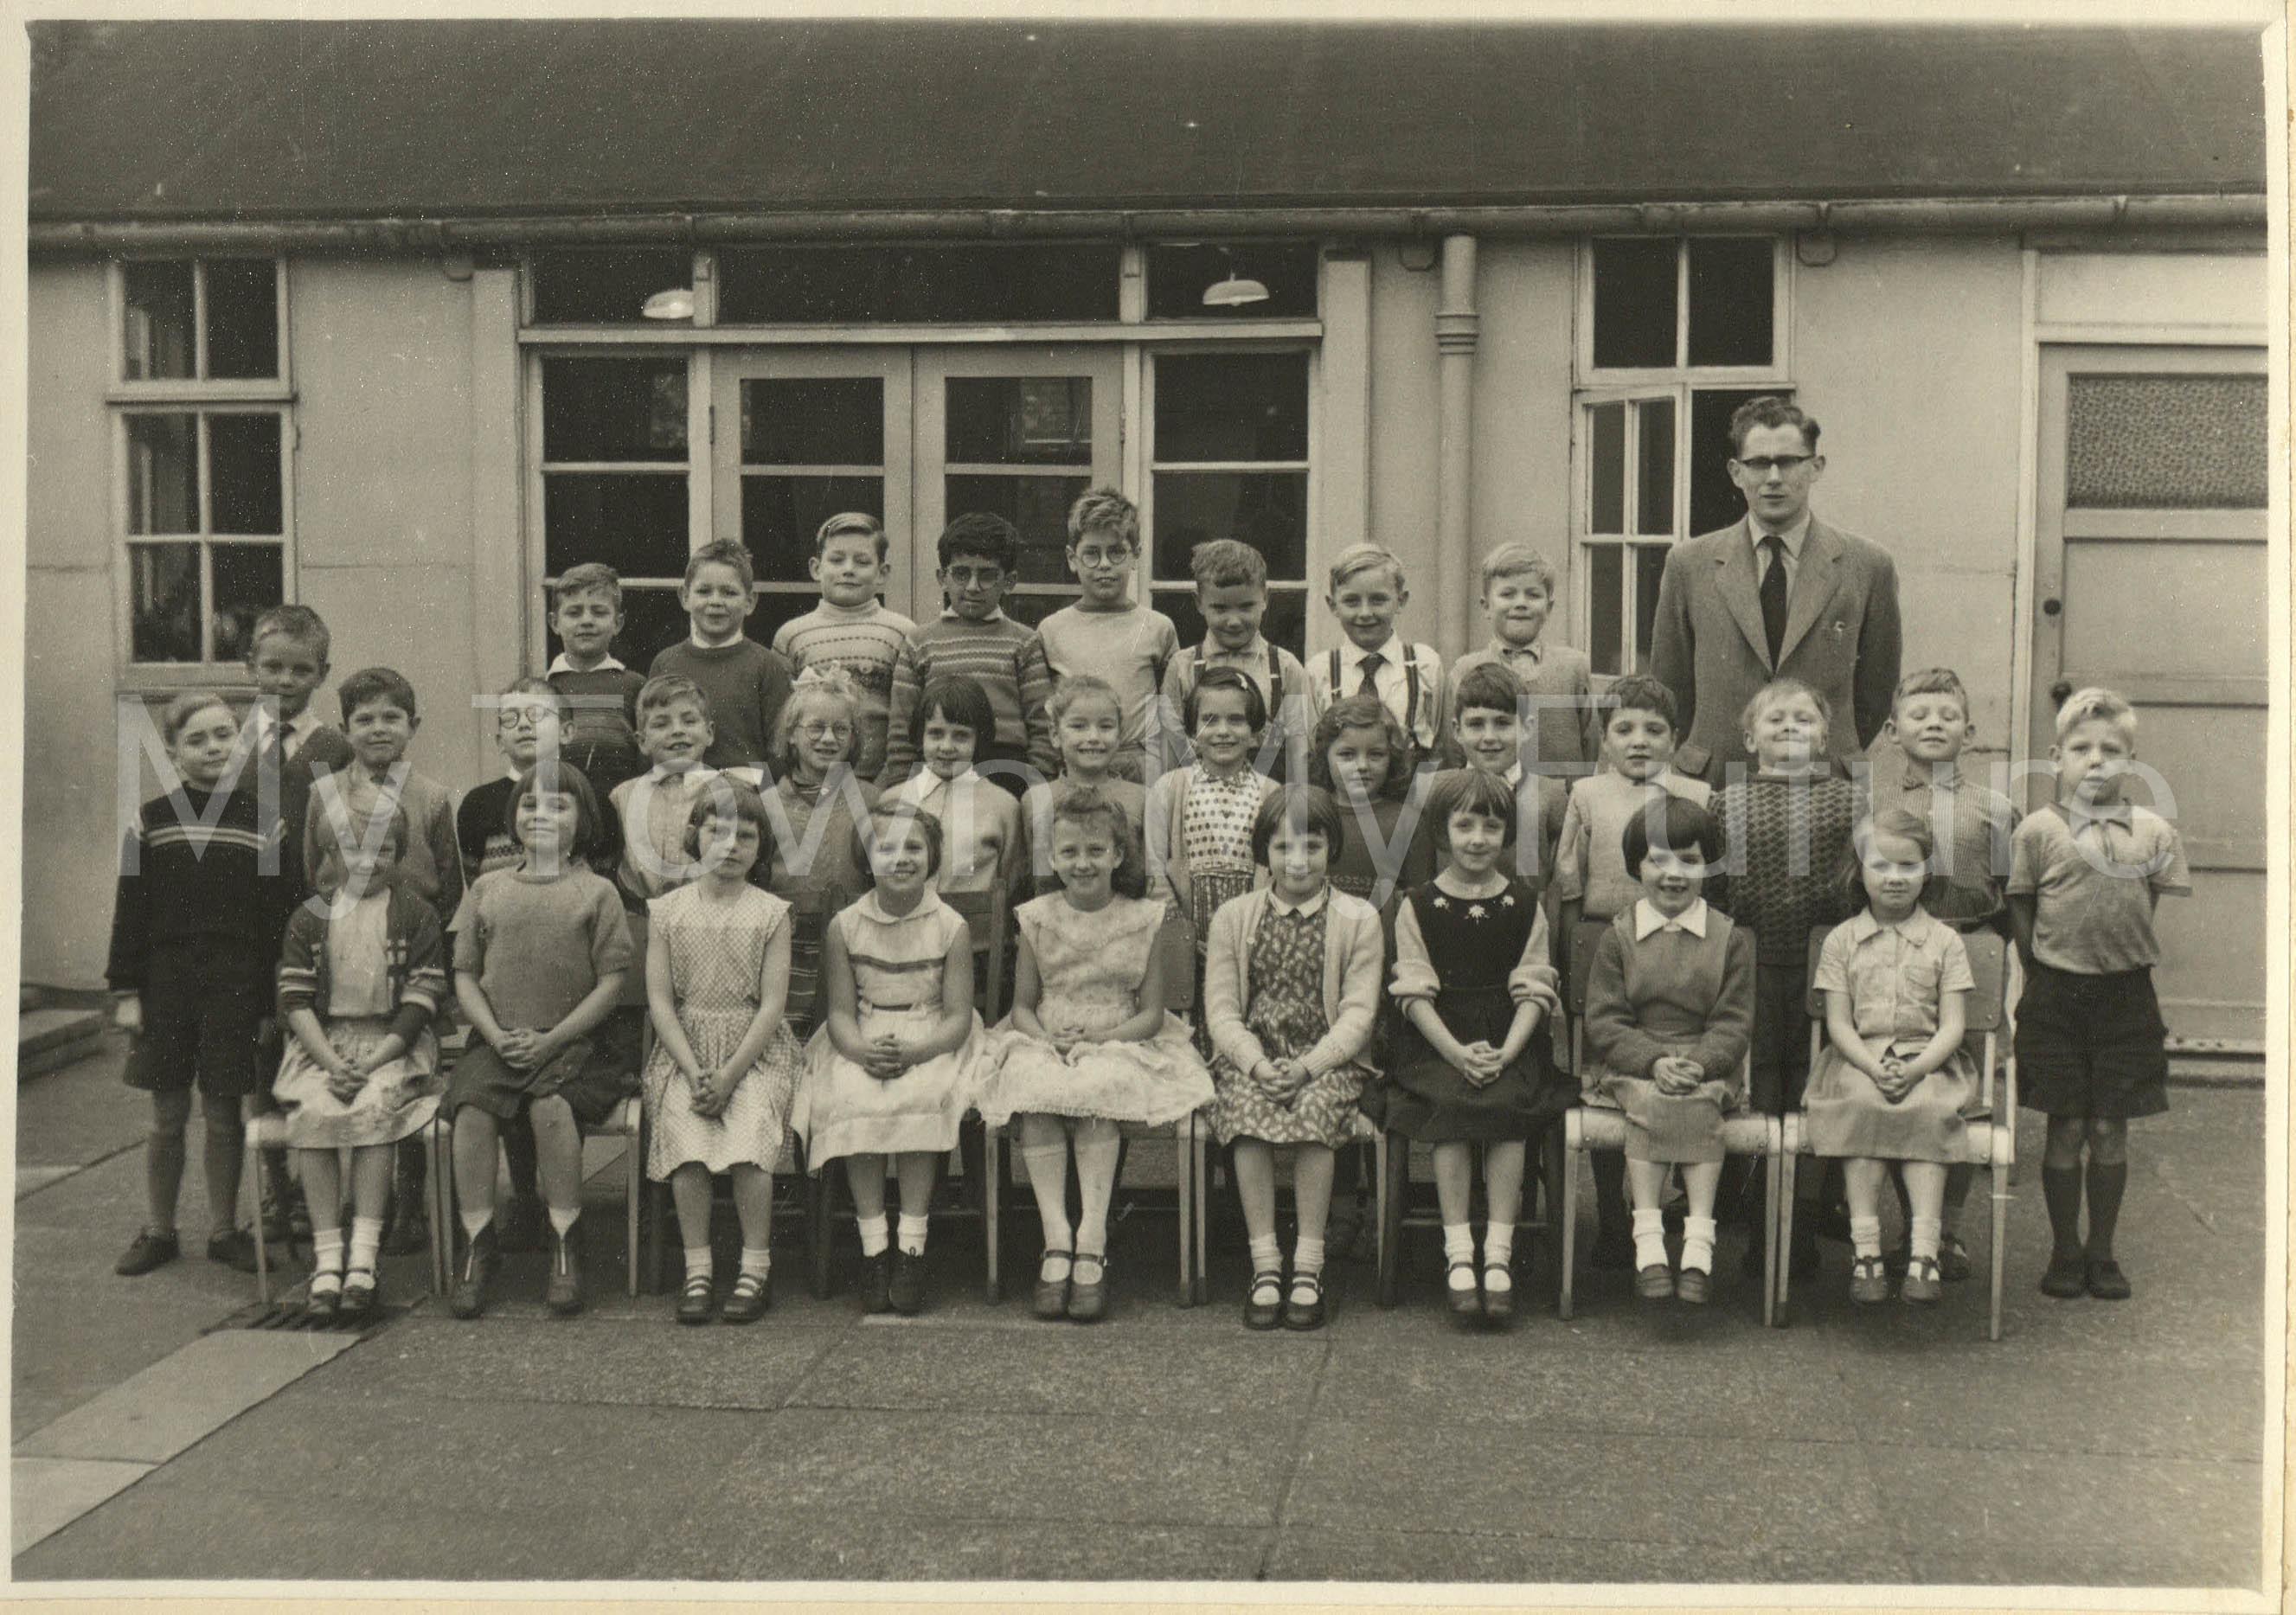 Fleetham Steet School